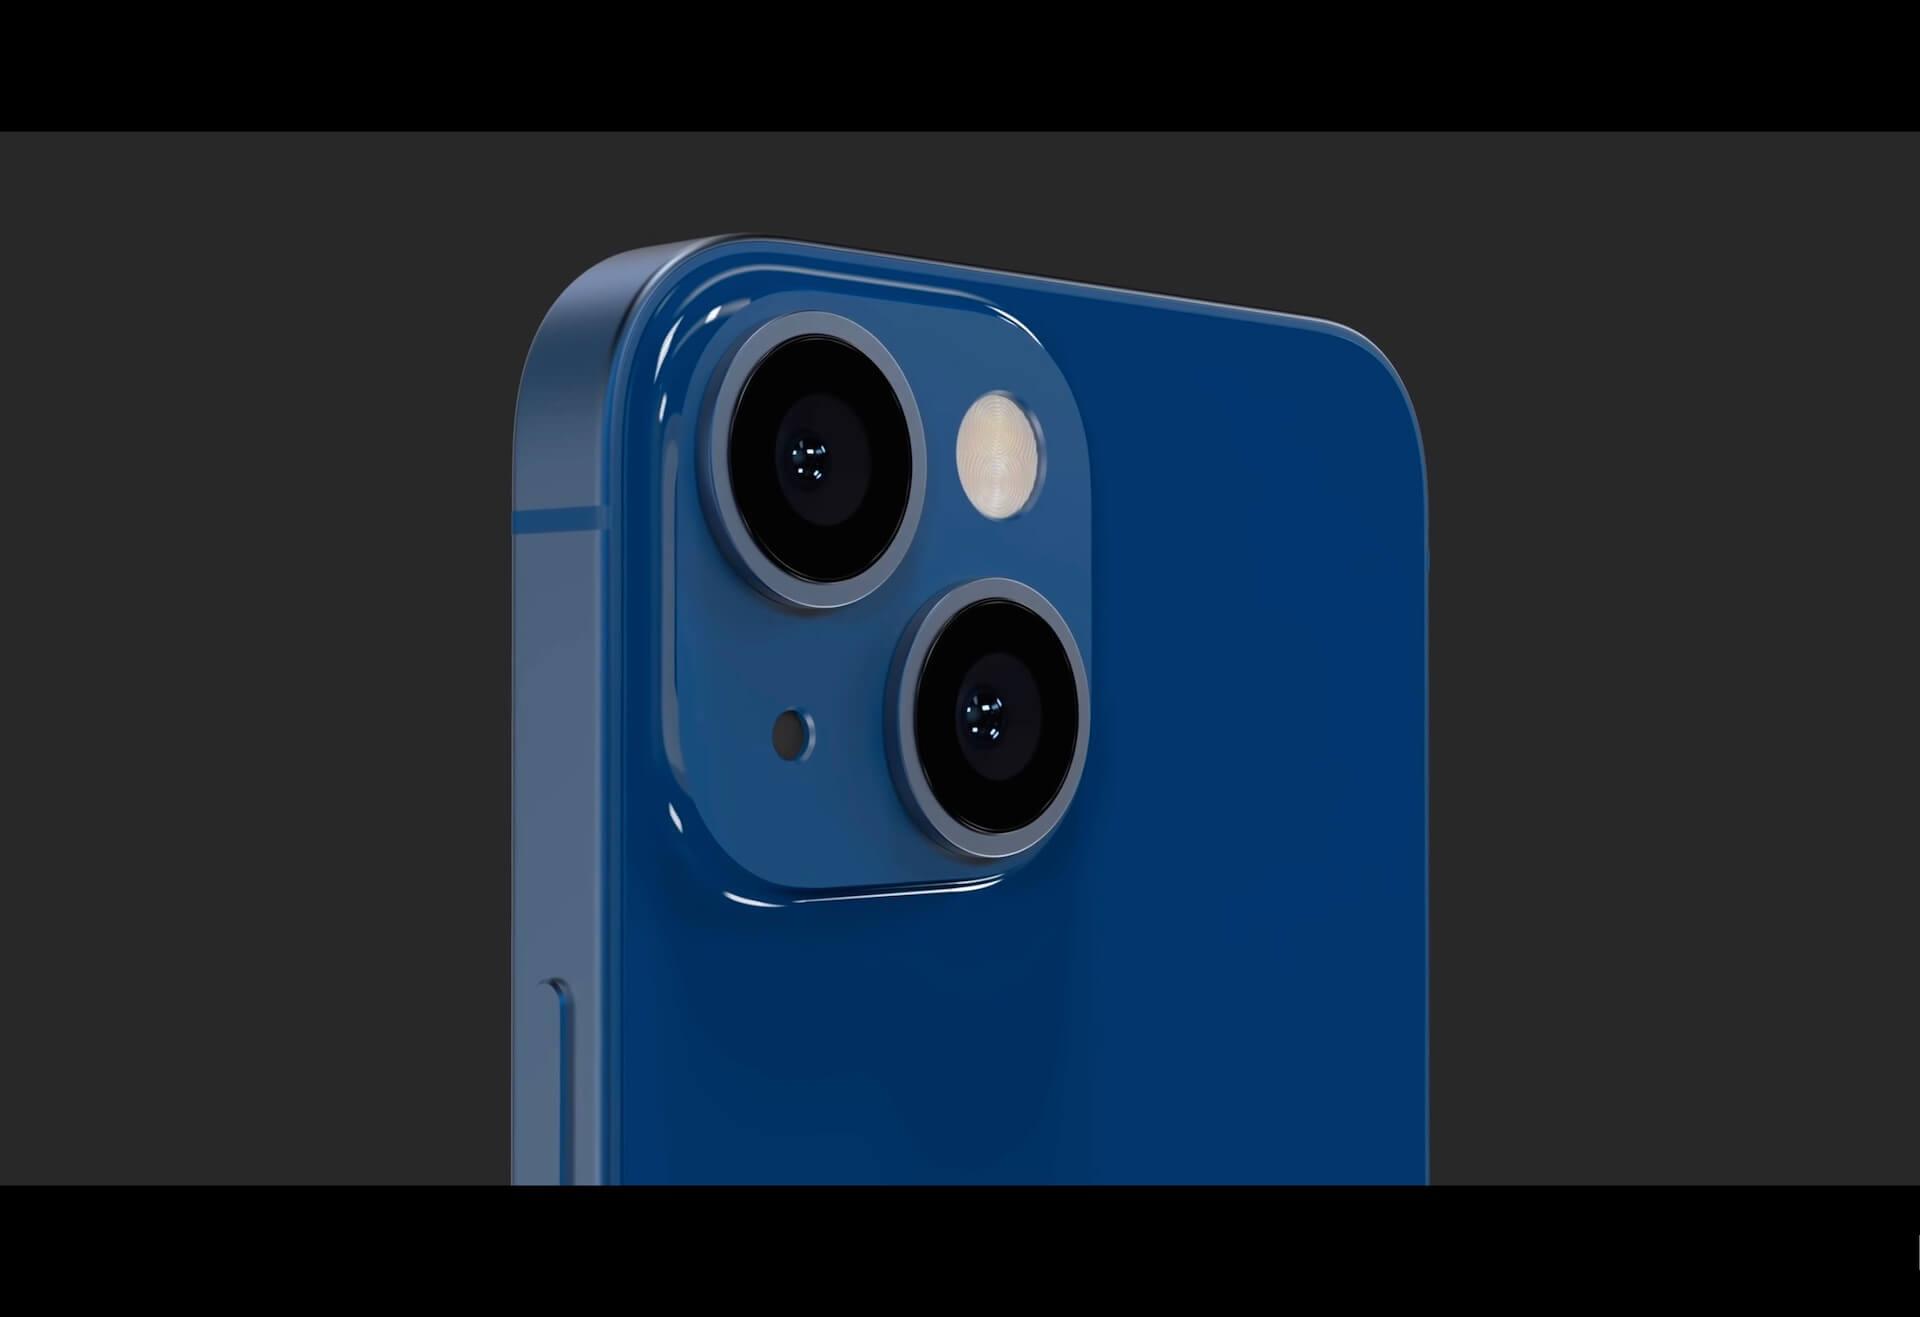 iPhone 13 miniのプロトタイプ機の画像がリーク!?リアカメラの並びが斜線状になる可能性 tech210423_iphone13mini_main